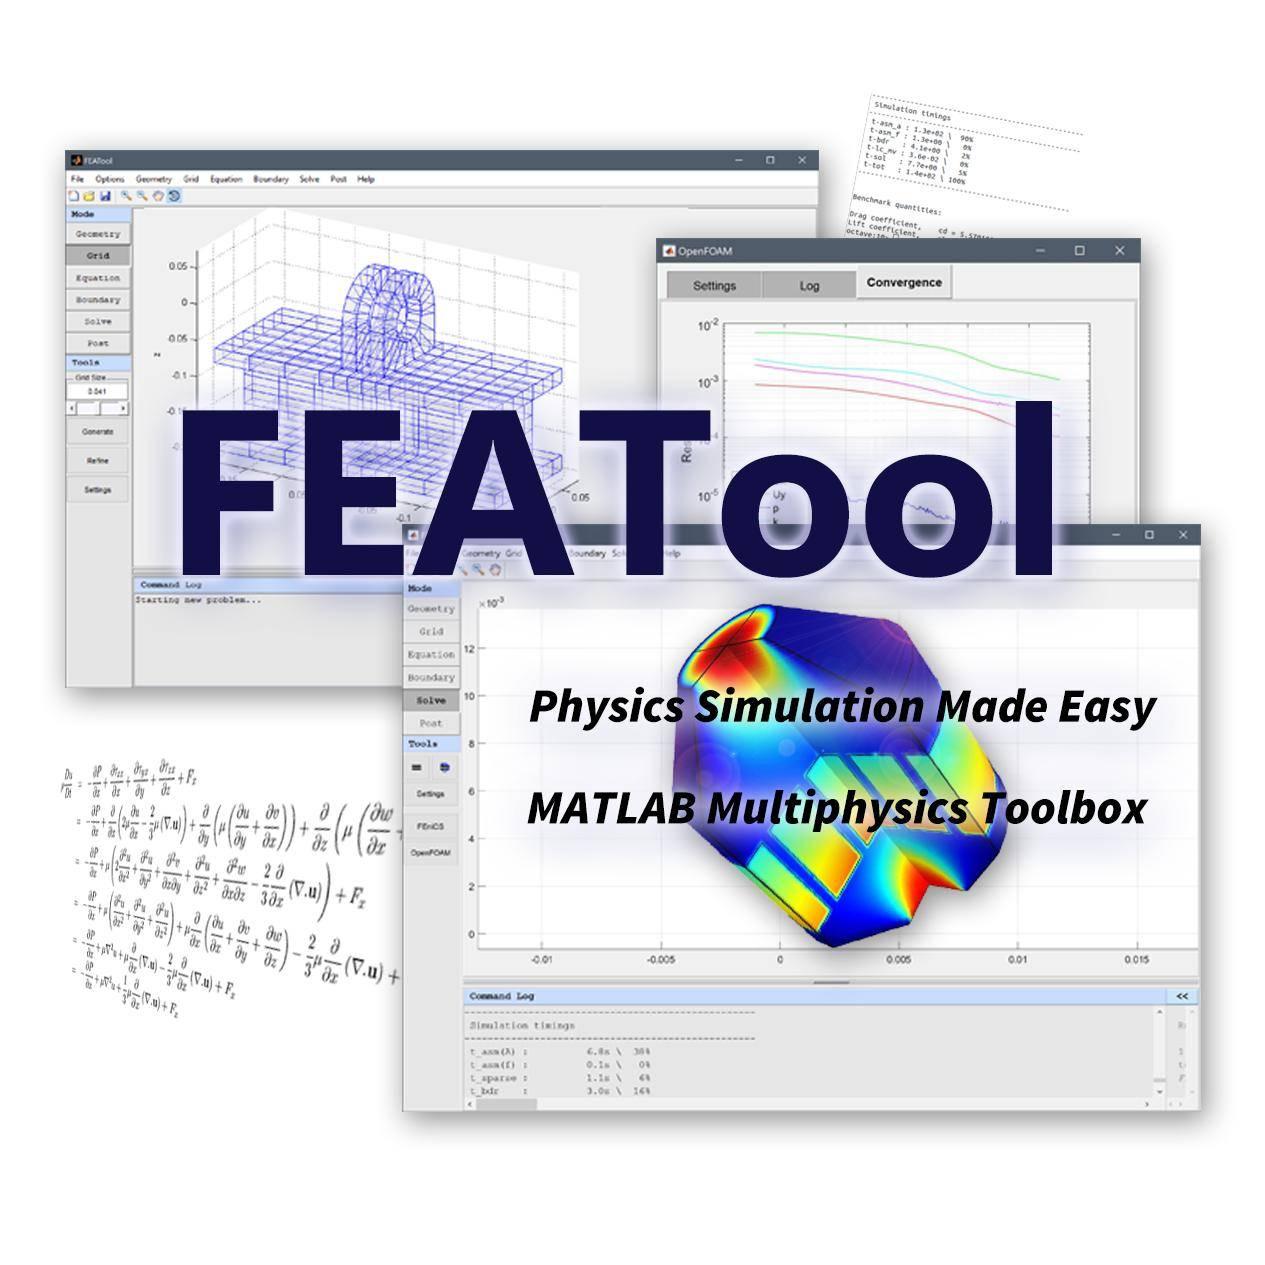 Matlab 2009b license file crack | Cracking the Licence of Matlab to